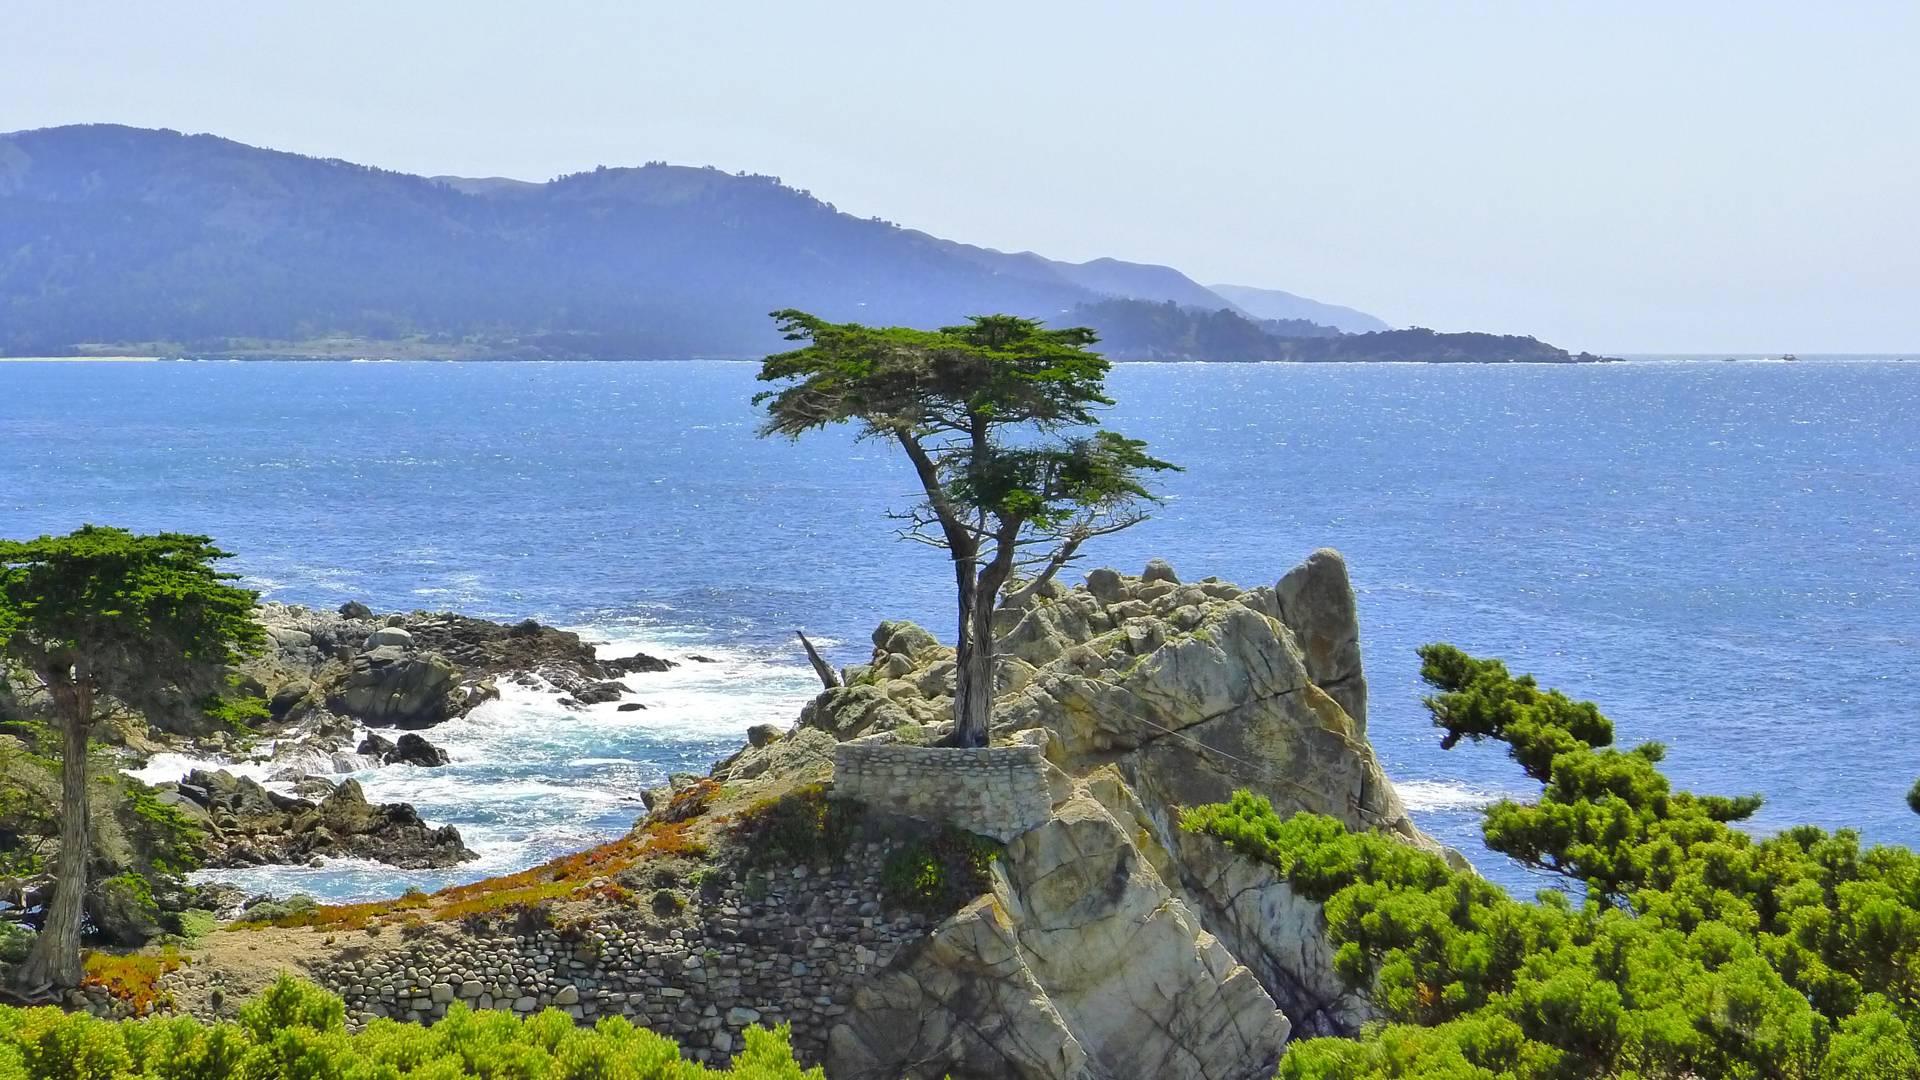 5-Day San Francisco, Monterey, 17-Mile Scenic Drive Tour